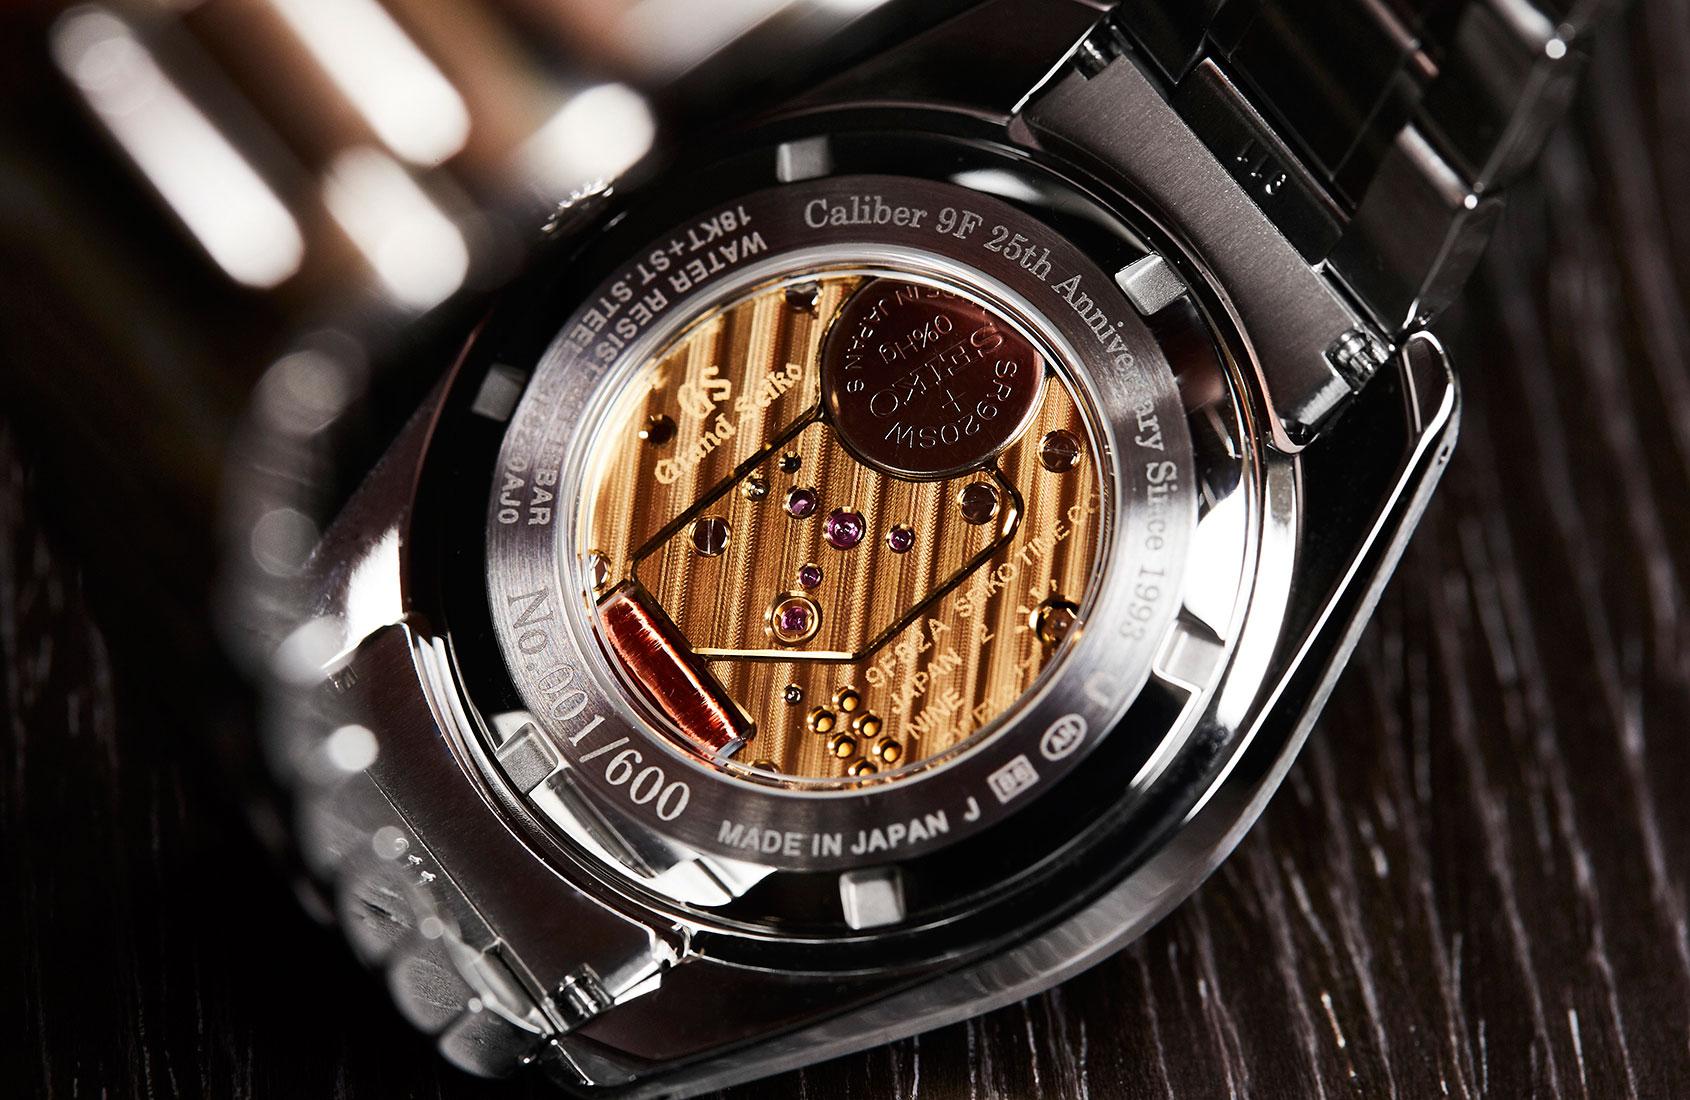 6 impressive quartz watches released in 2020, including Grand Seiko, Breitling and Bulova